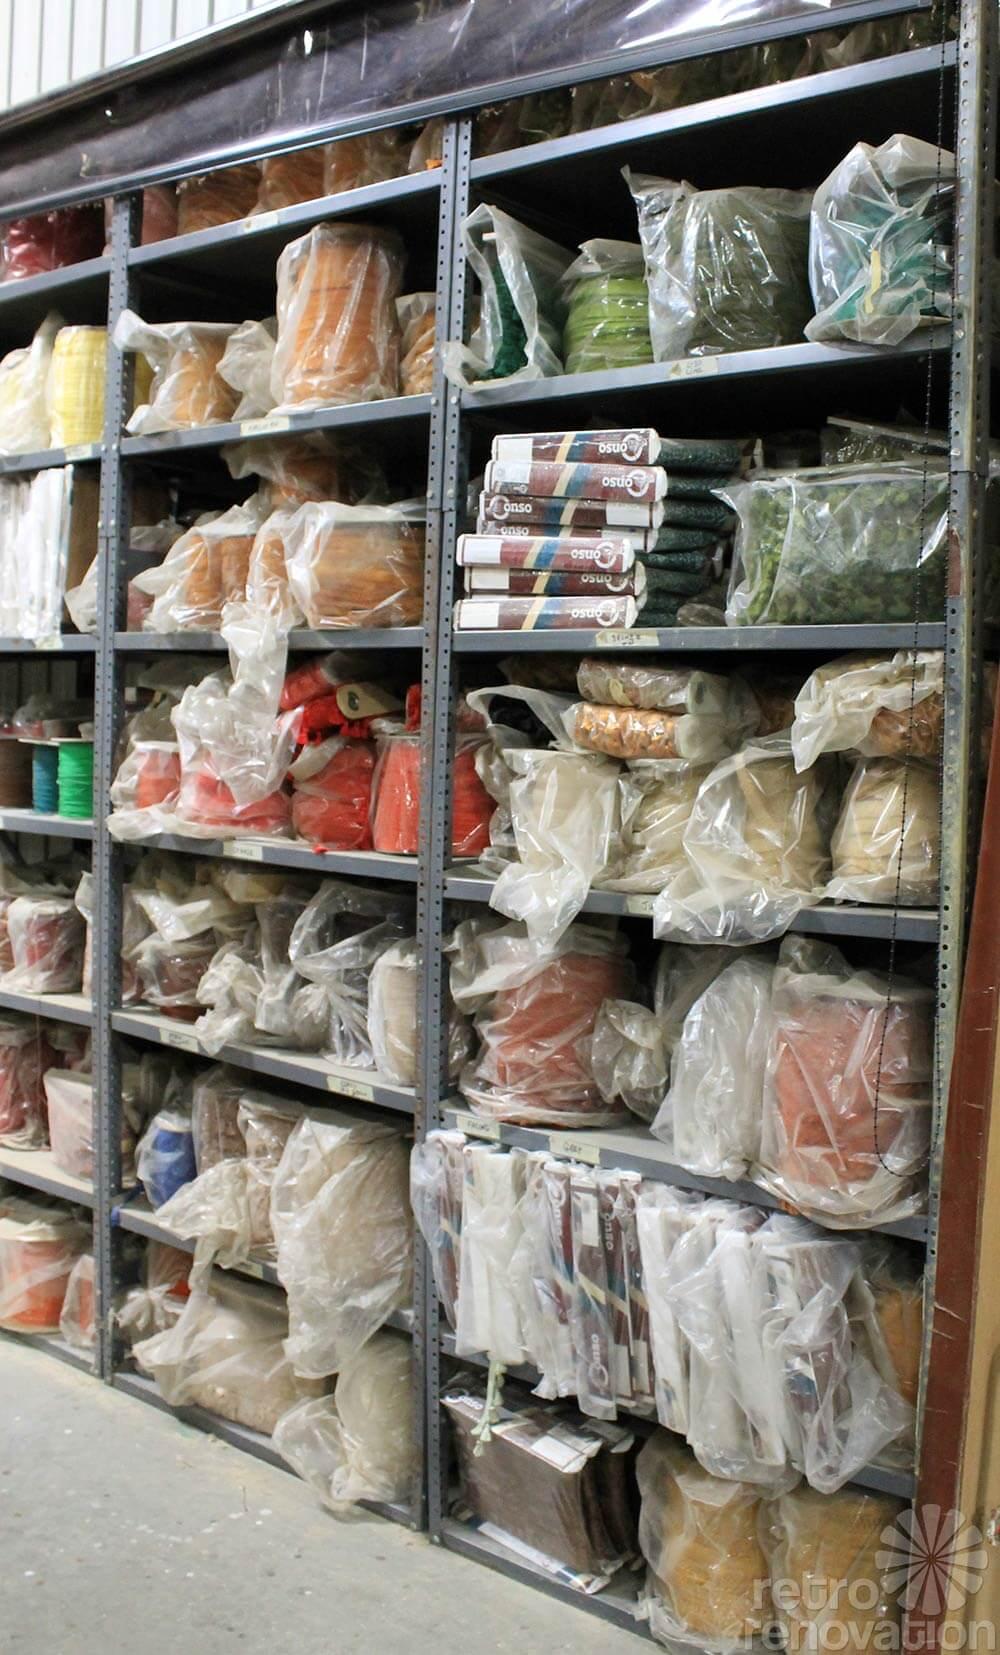 Shelf Full Of Trim